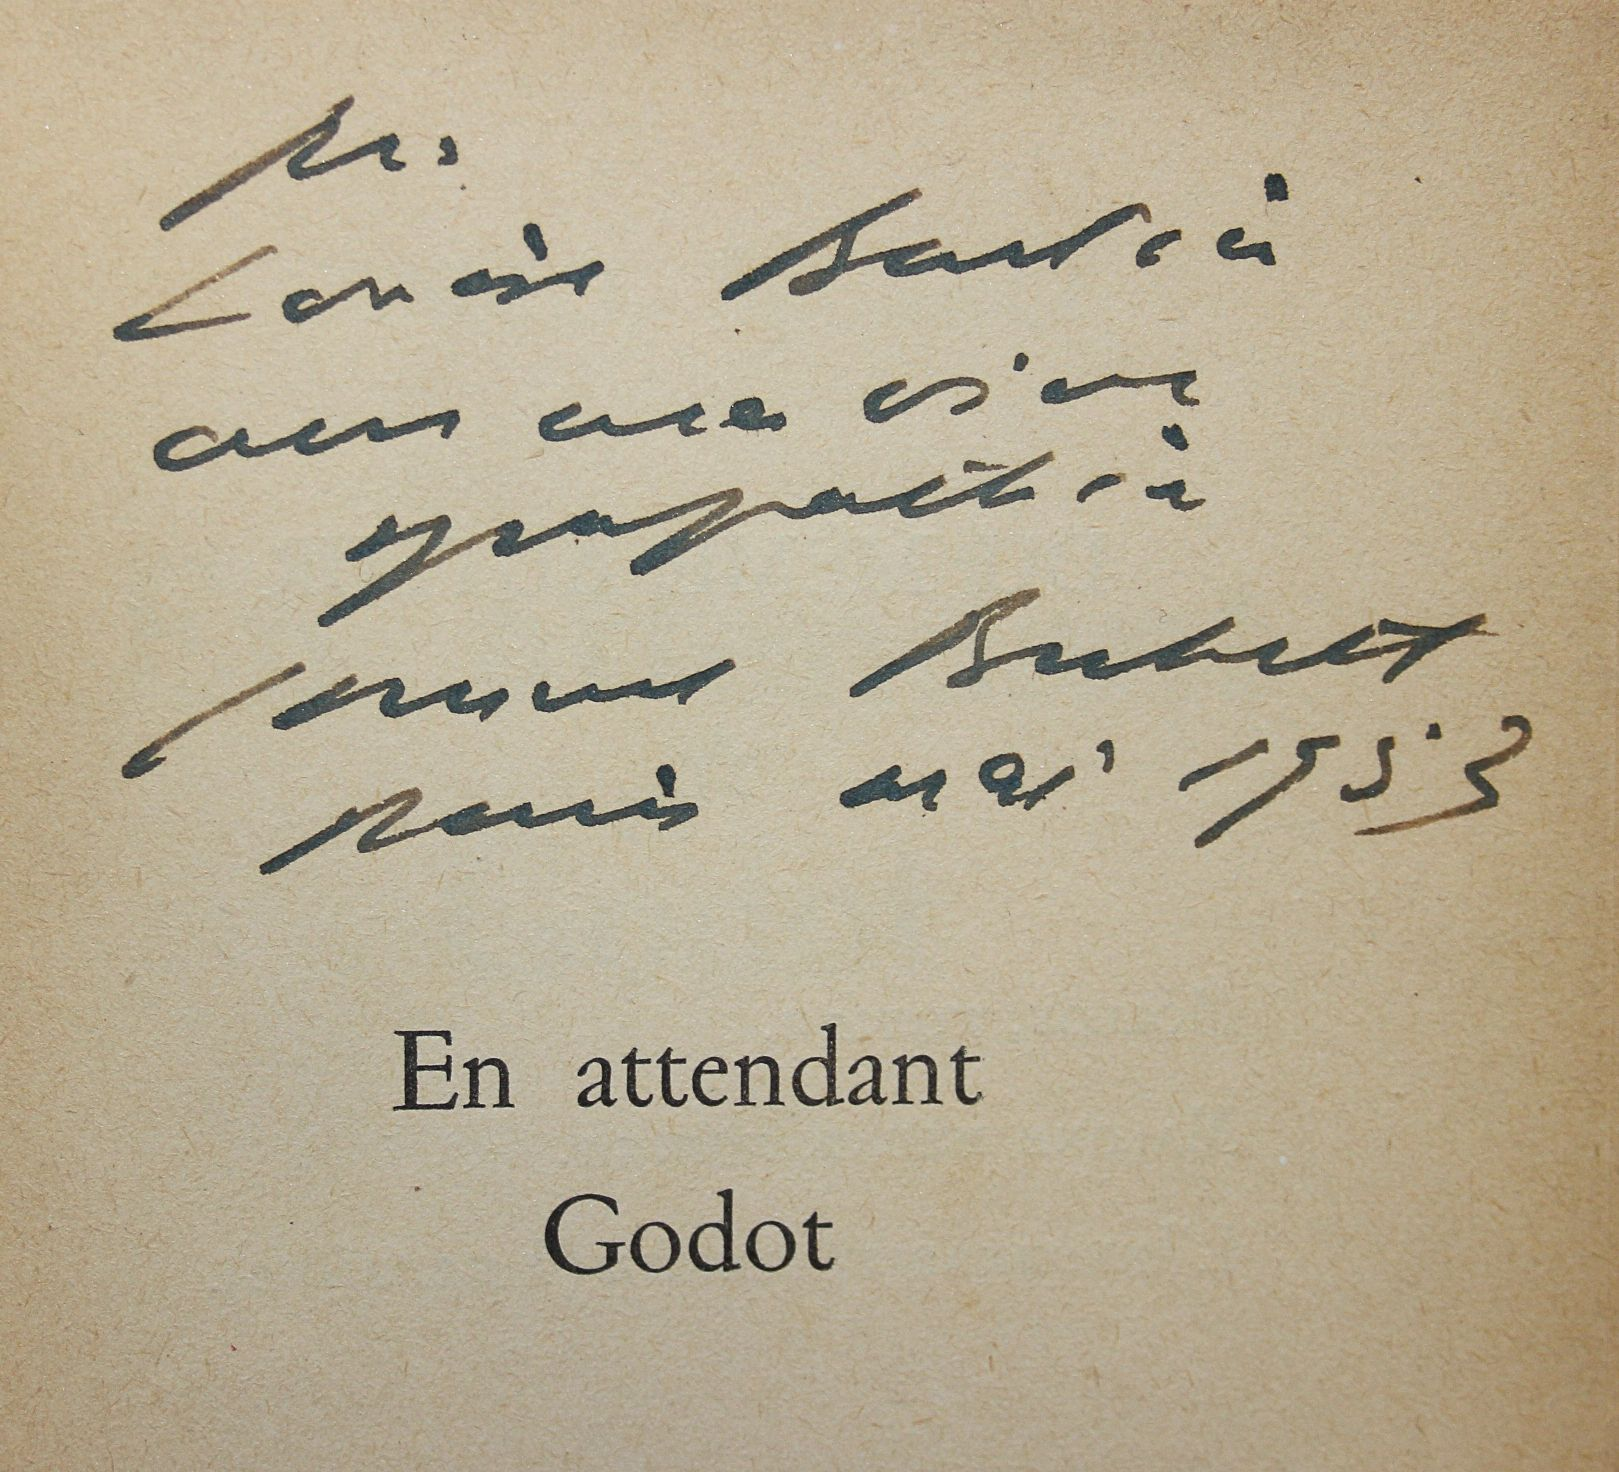 Samuel Beckett - En attendant Godot. Envoi autographe signé.